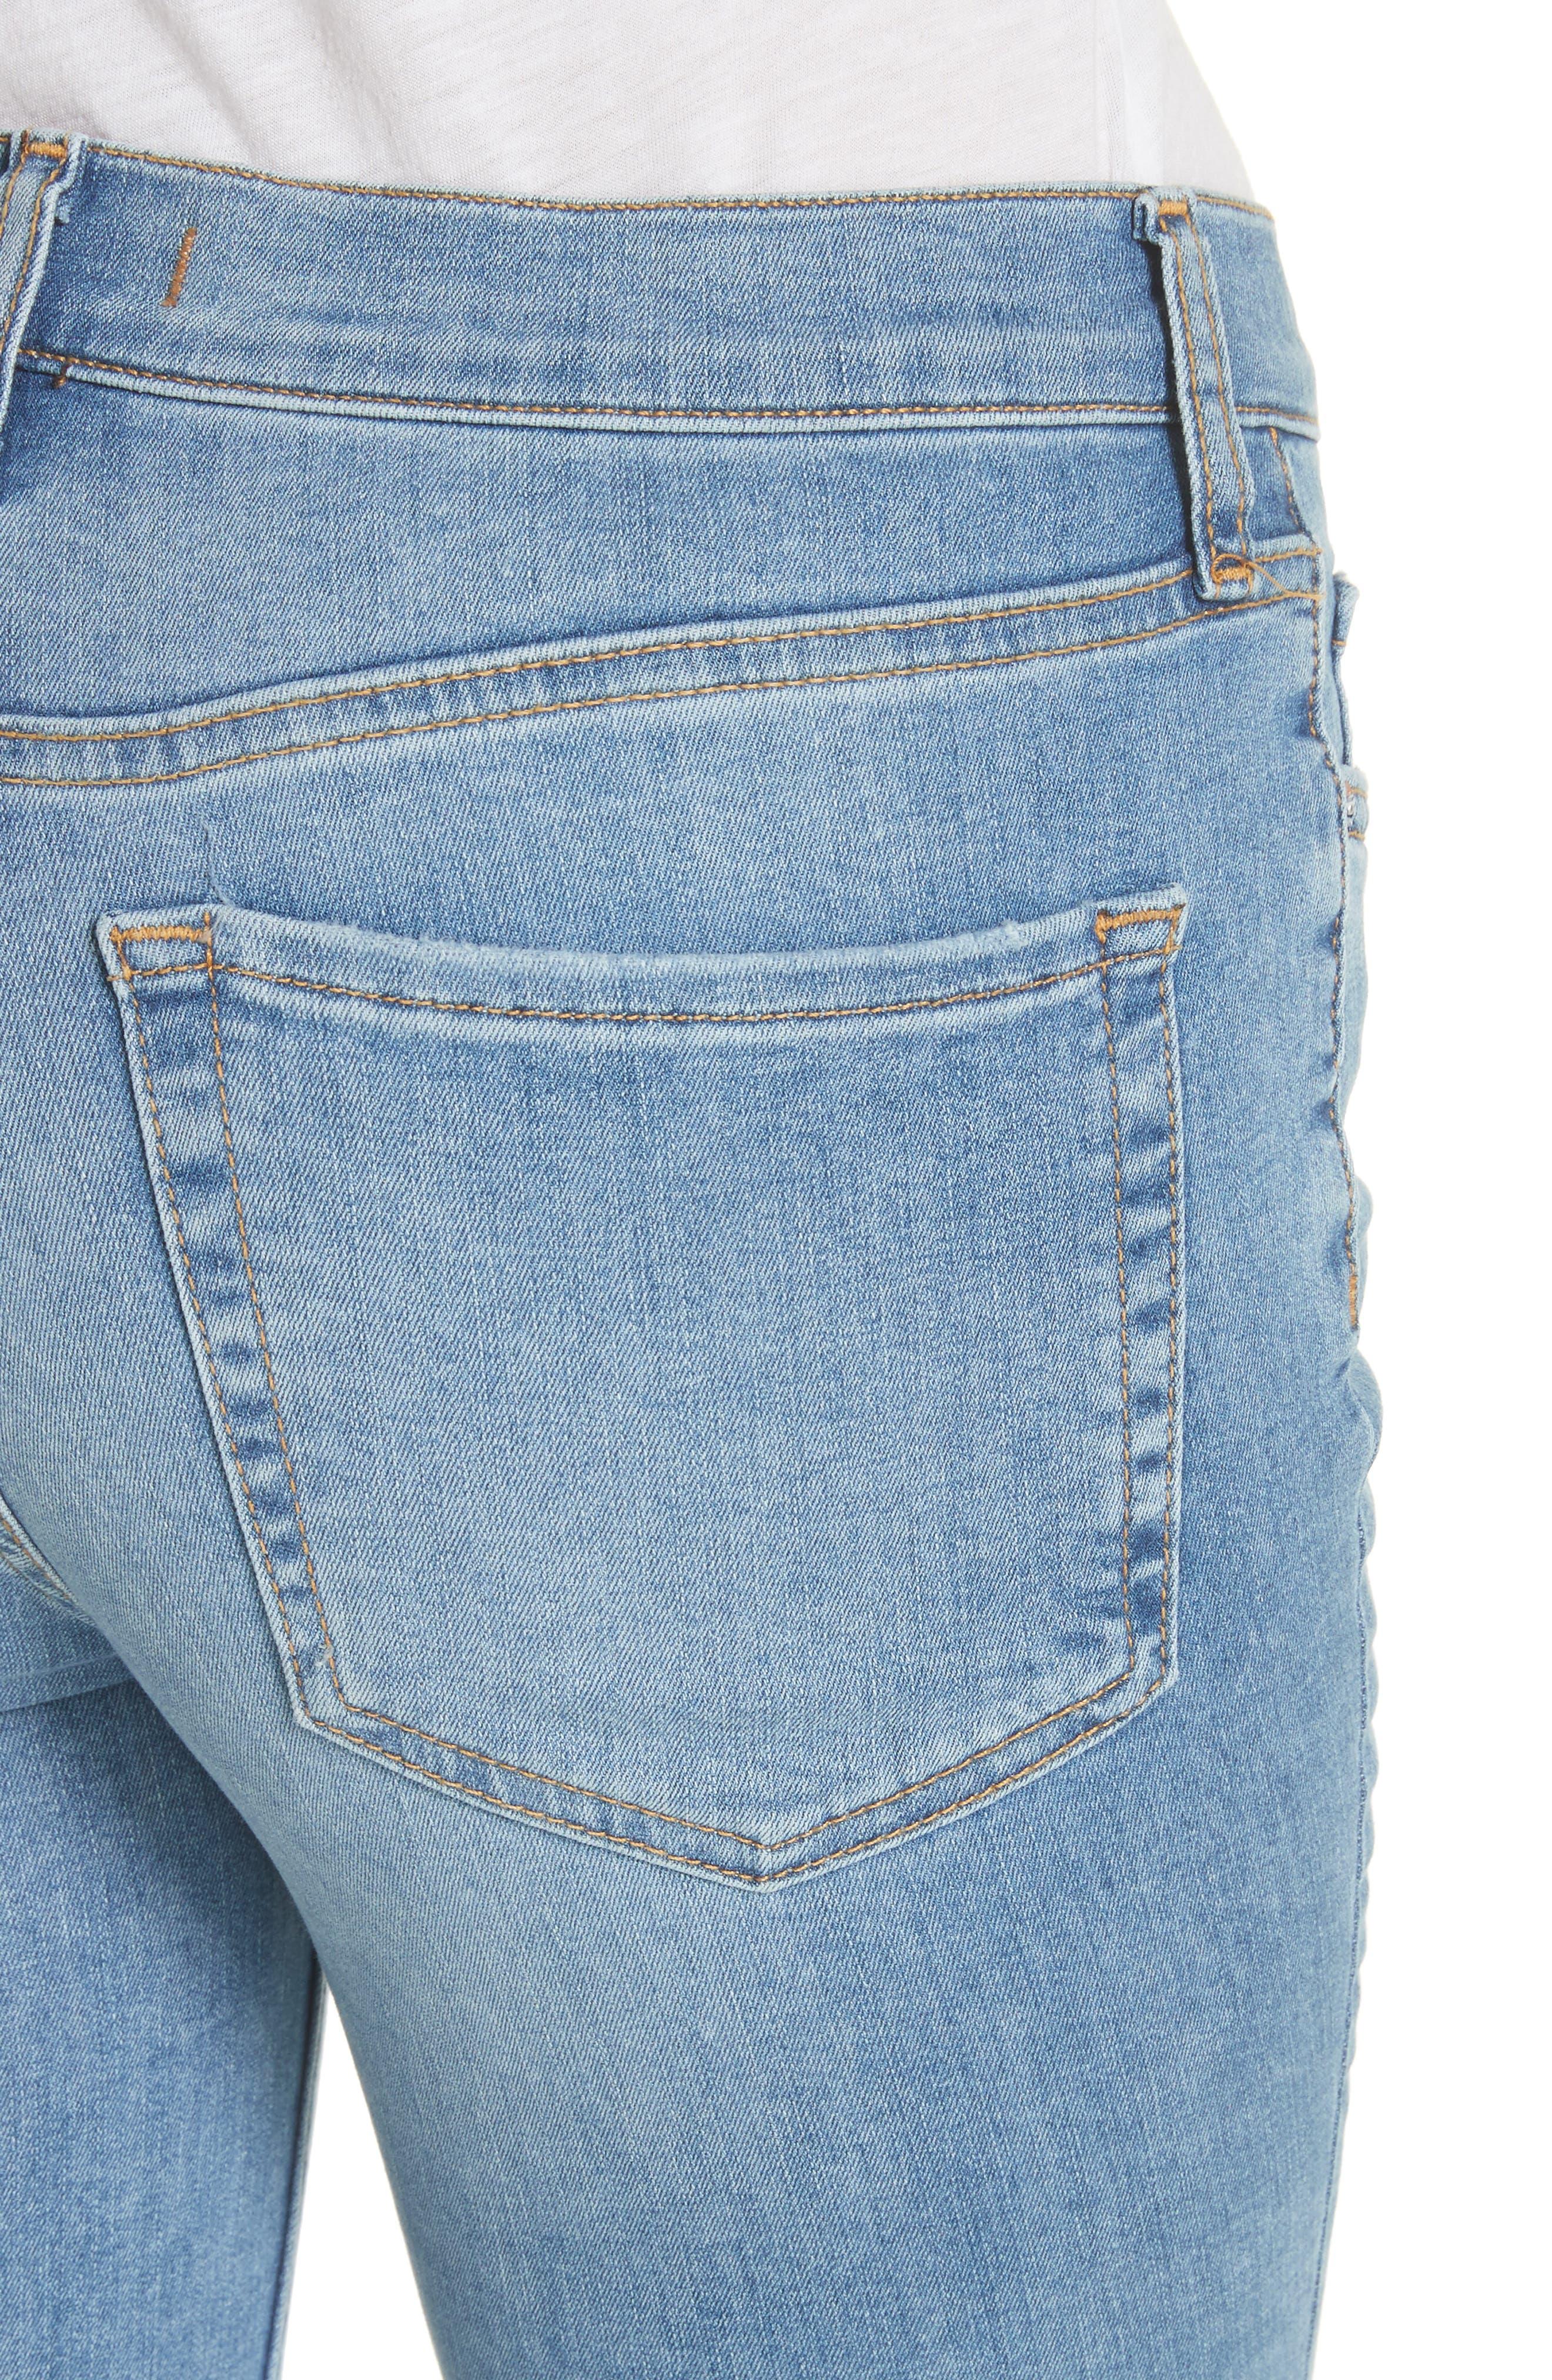 Alternate Image 4  - Free People High Waist Ankle Skinny Jeans